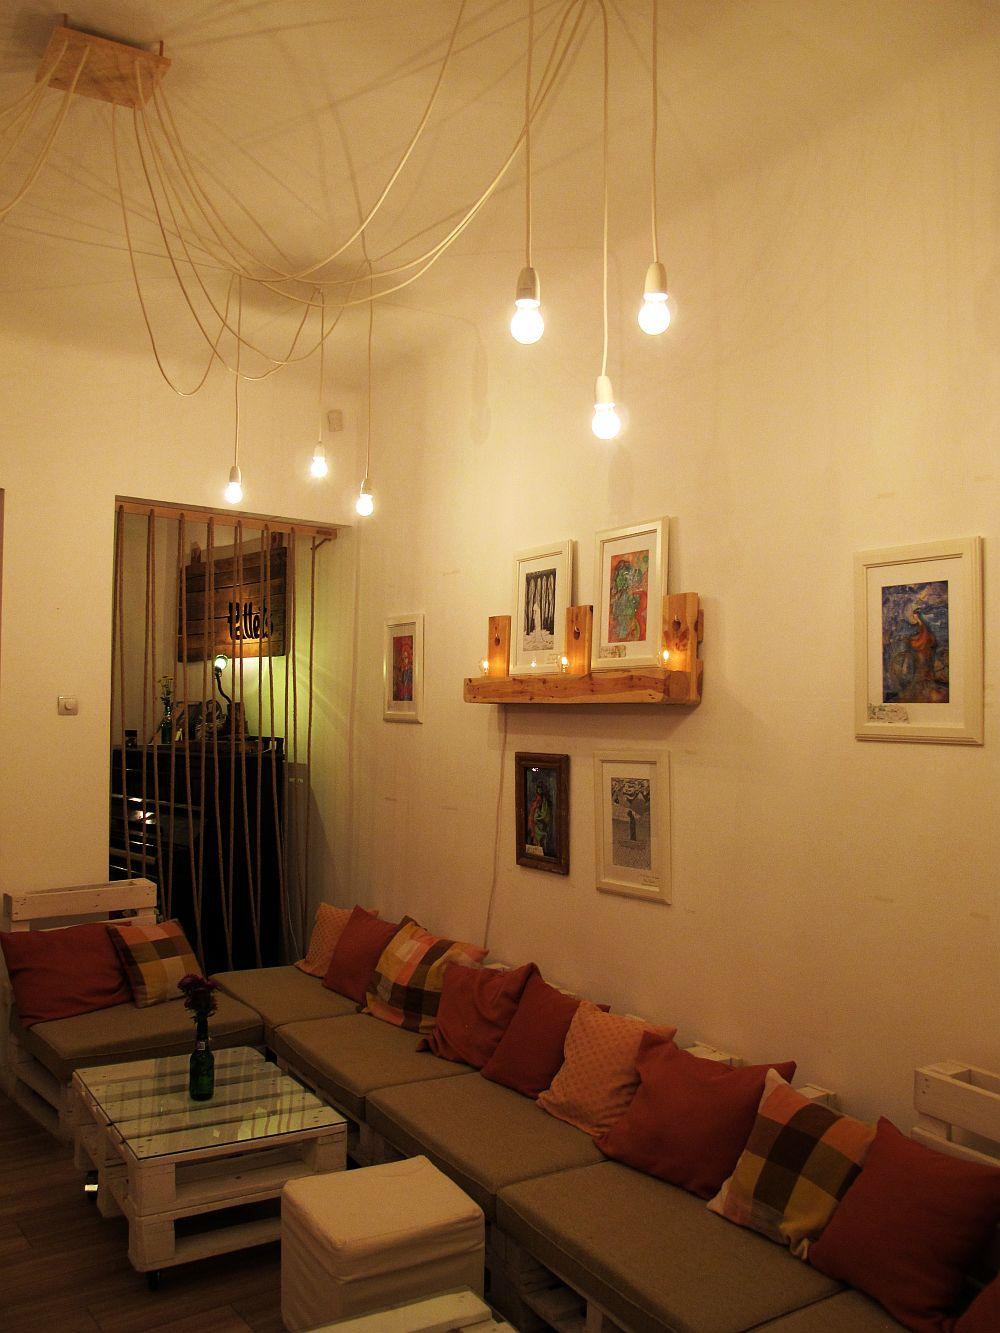 adelaparvu.com despre O povEstetica, expozitie la Pallets, artisti Alina Borcea si Anca Buzilan (8)